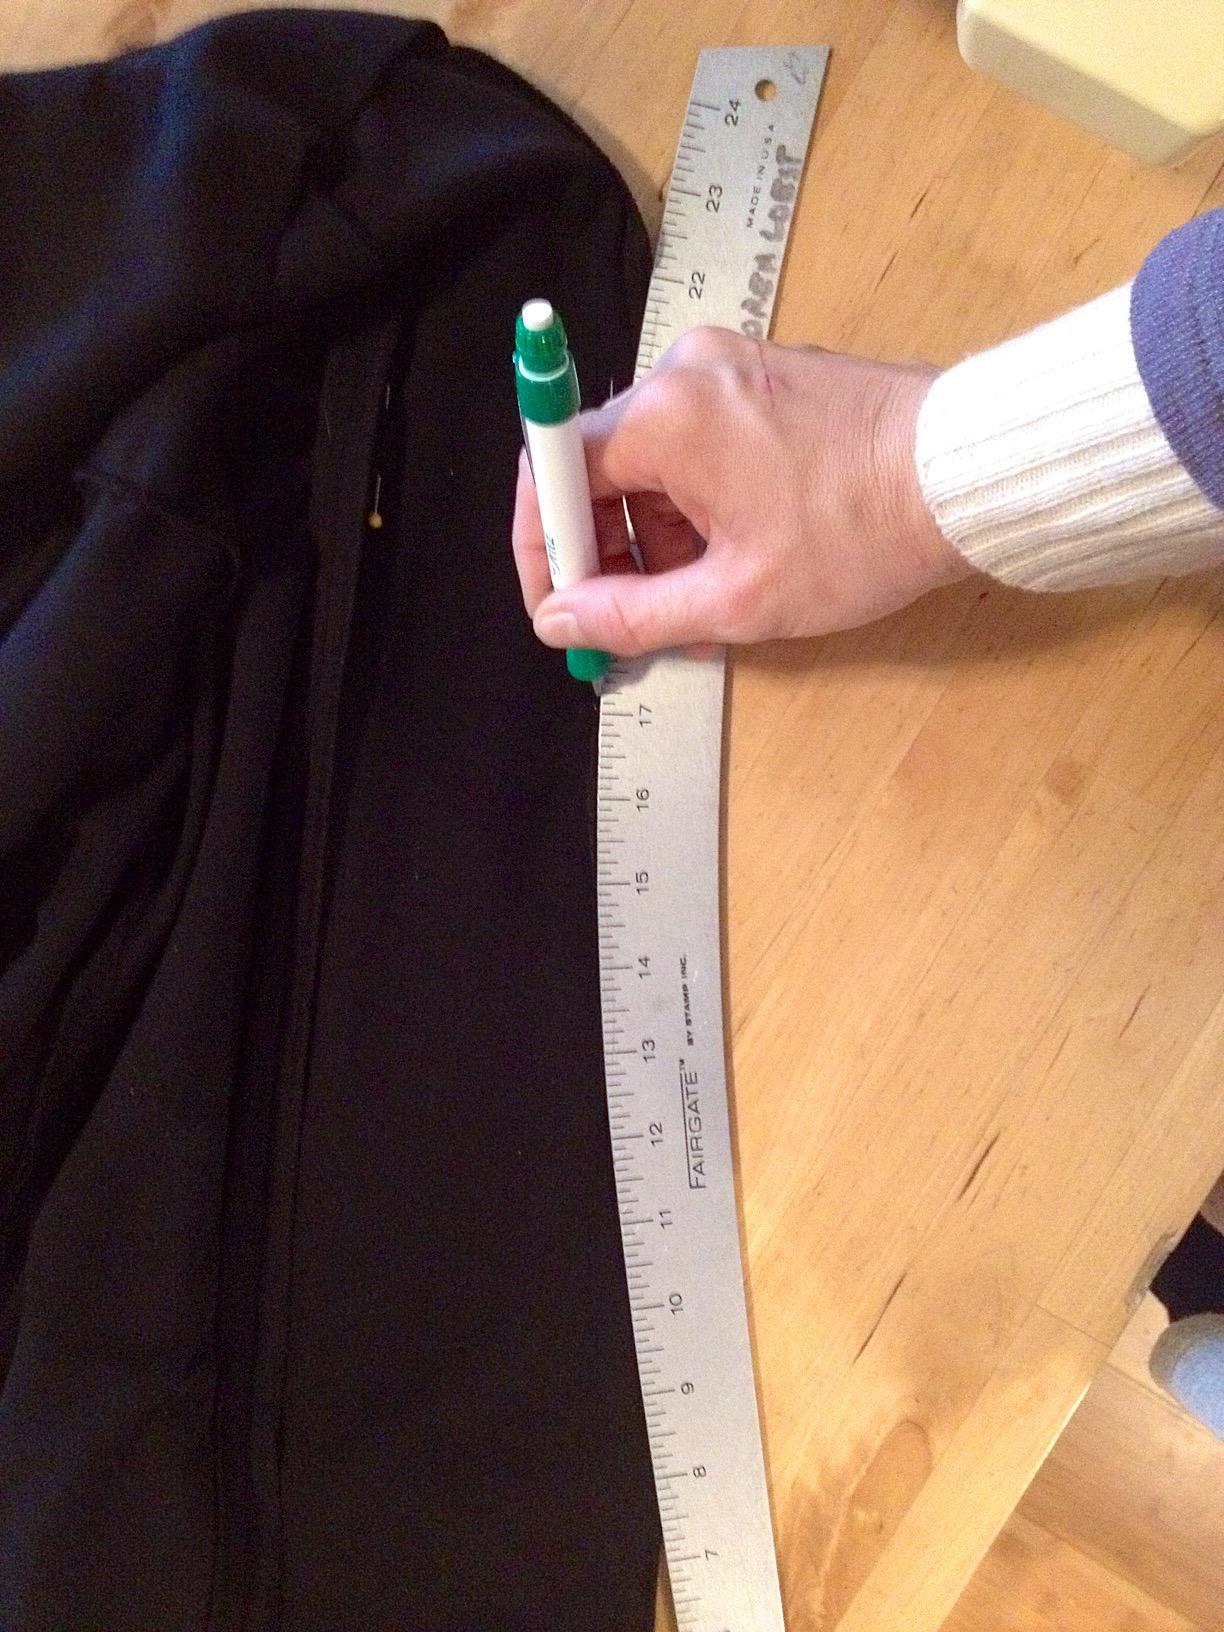 Fair Fit Alterations 2 Curve Stick and Dritz Pen